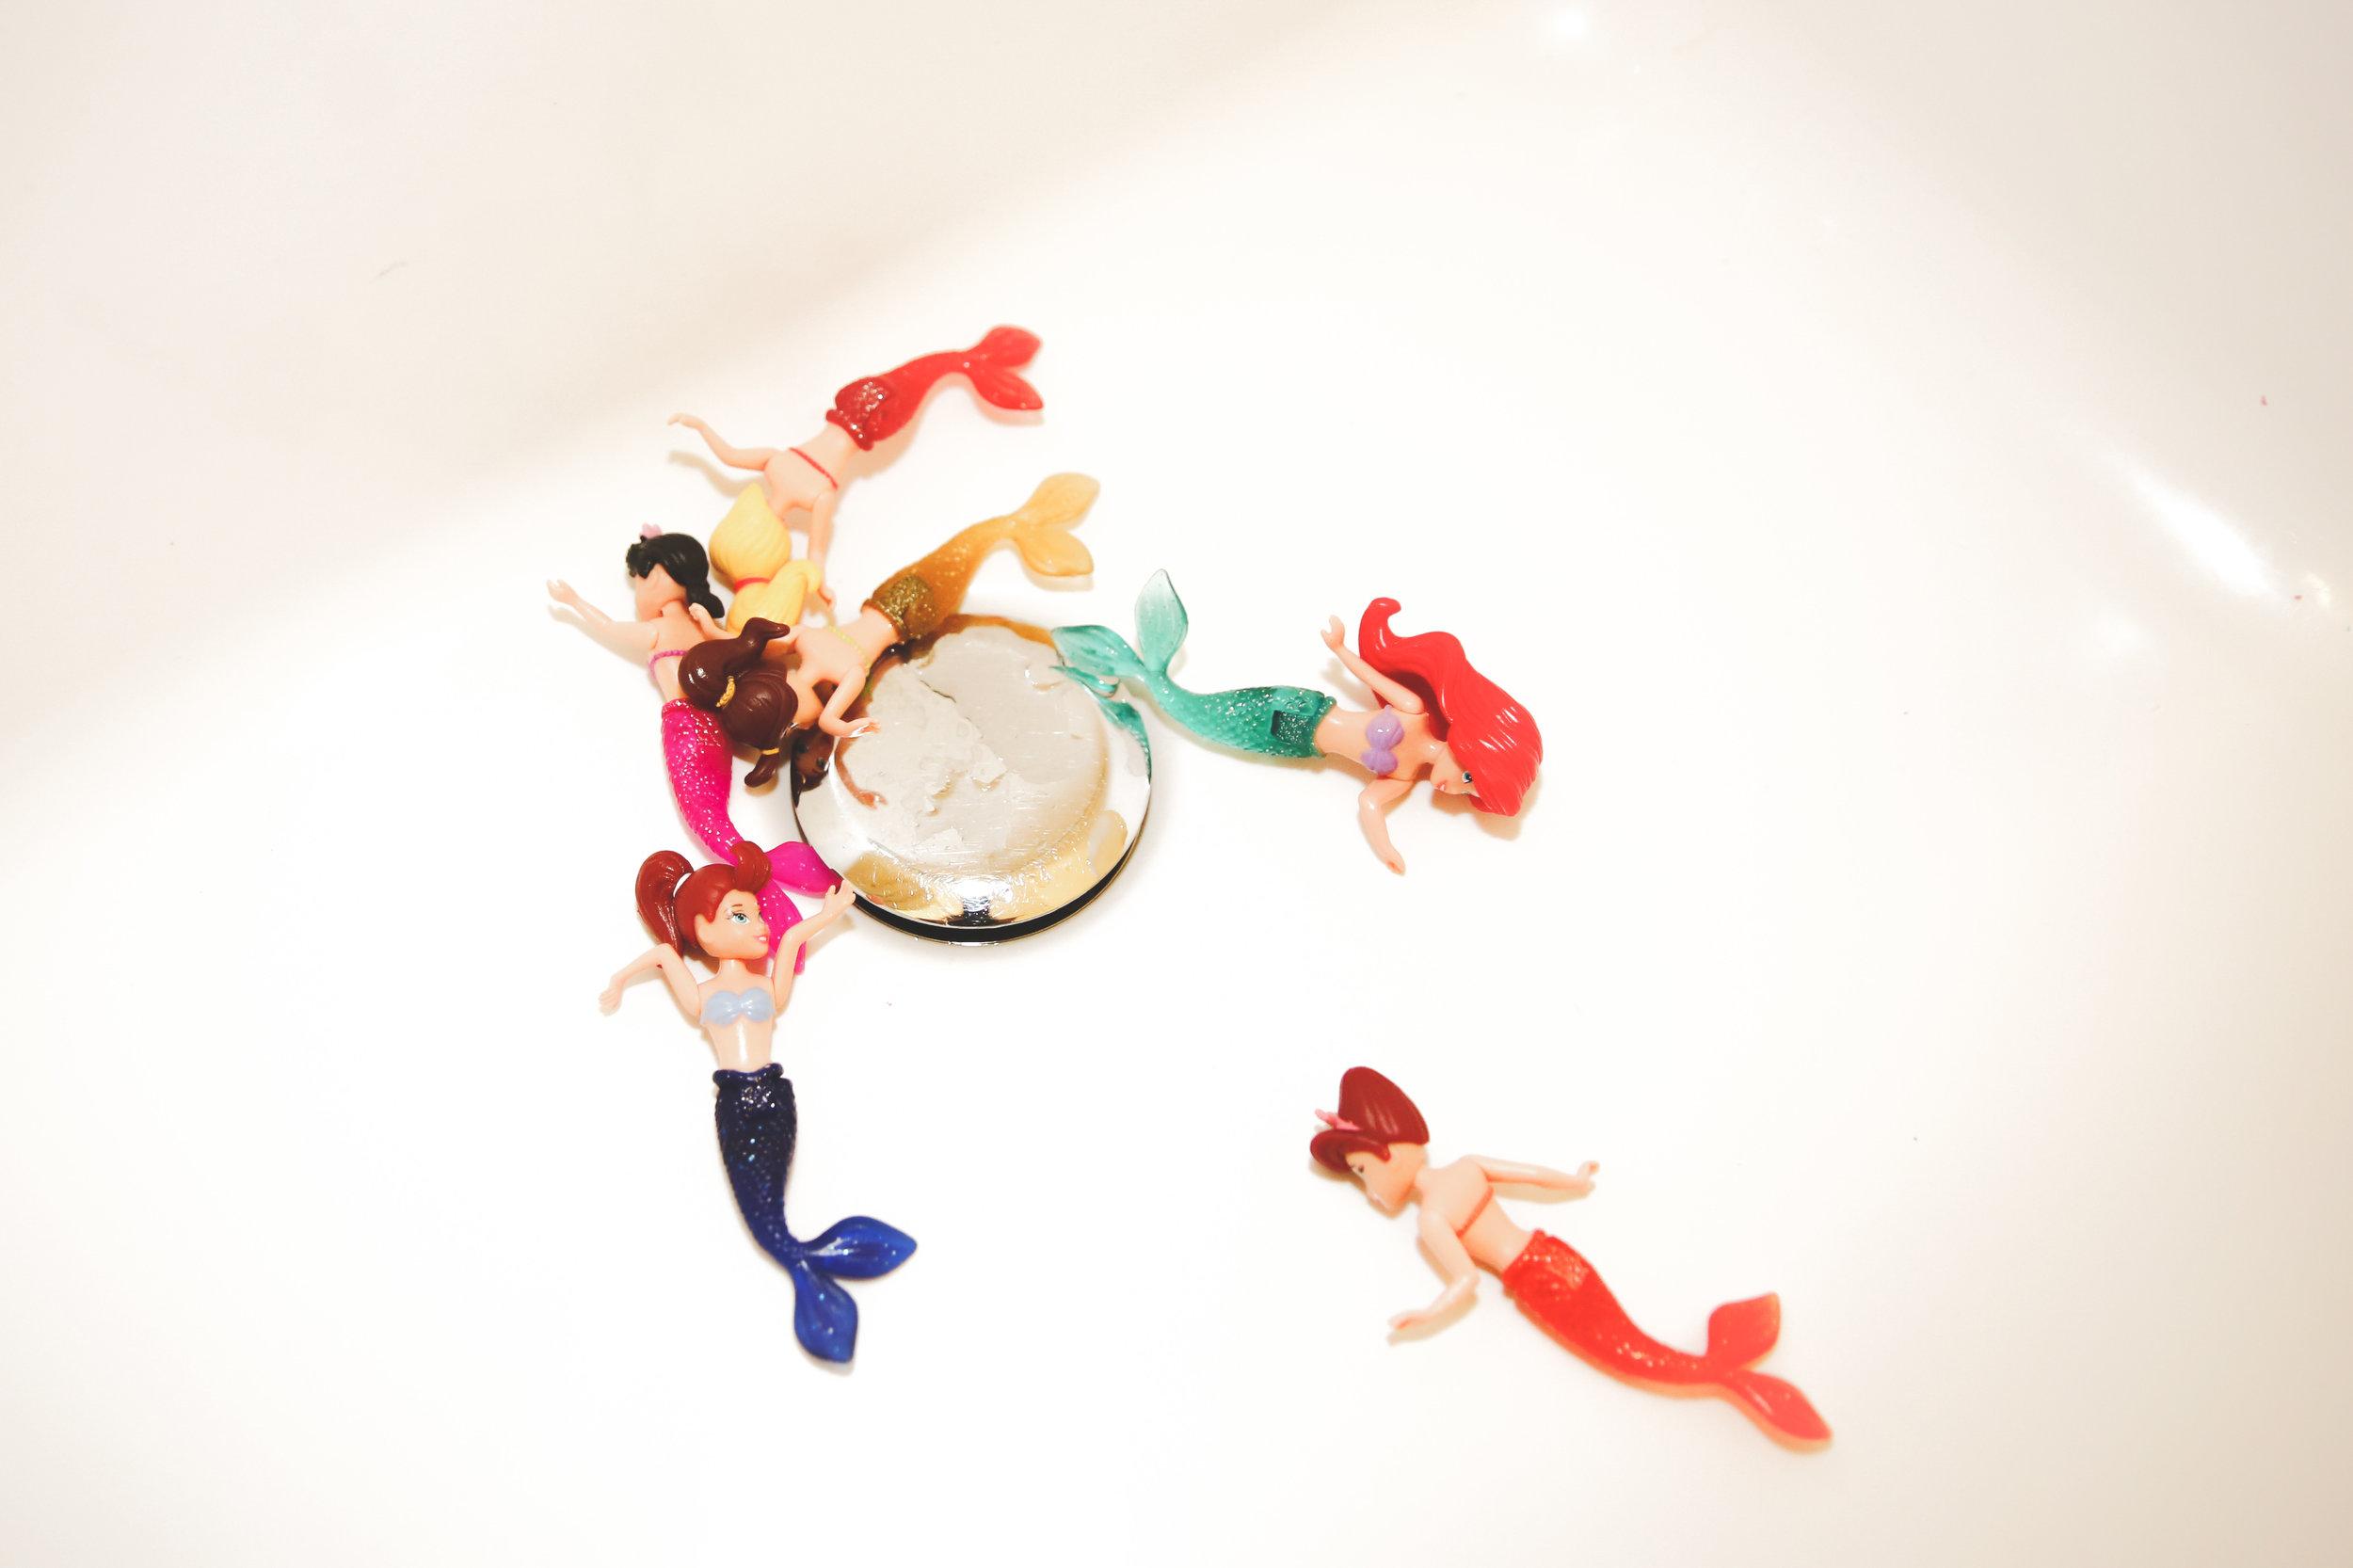 7W1A5375_mermaids_ritathompson-2.jpg